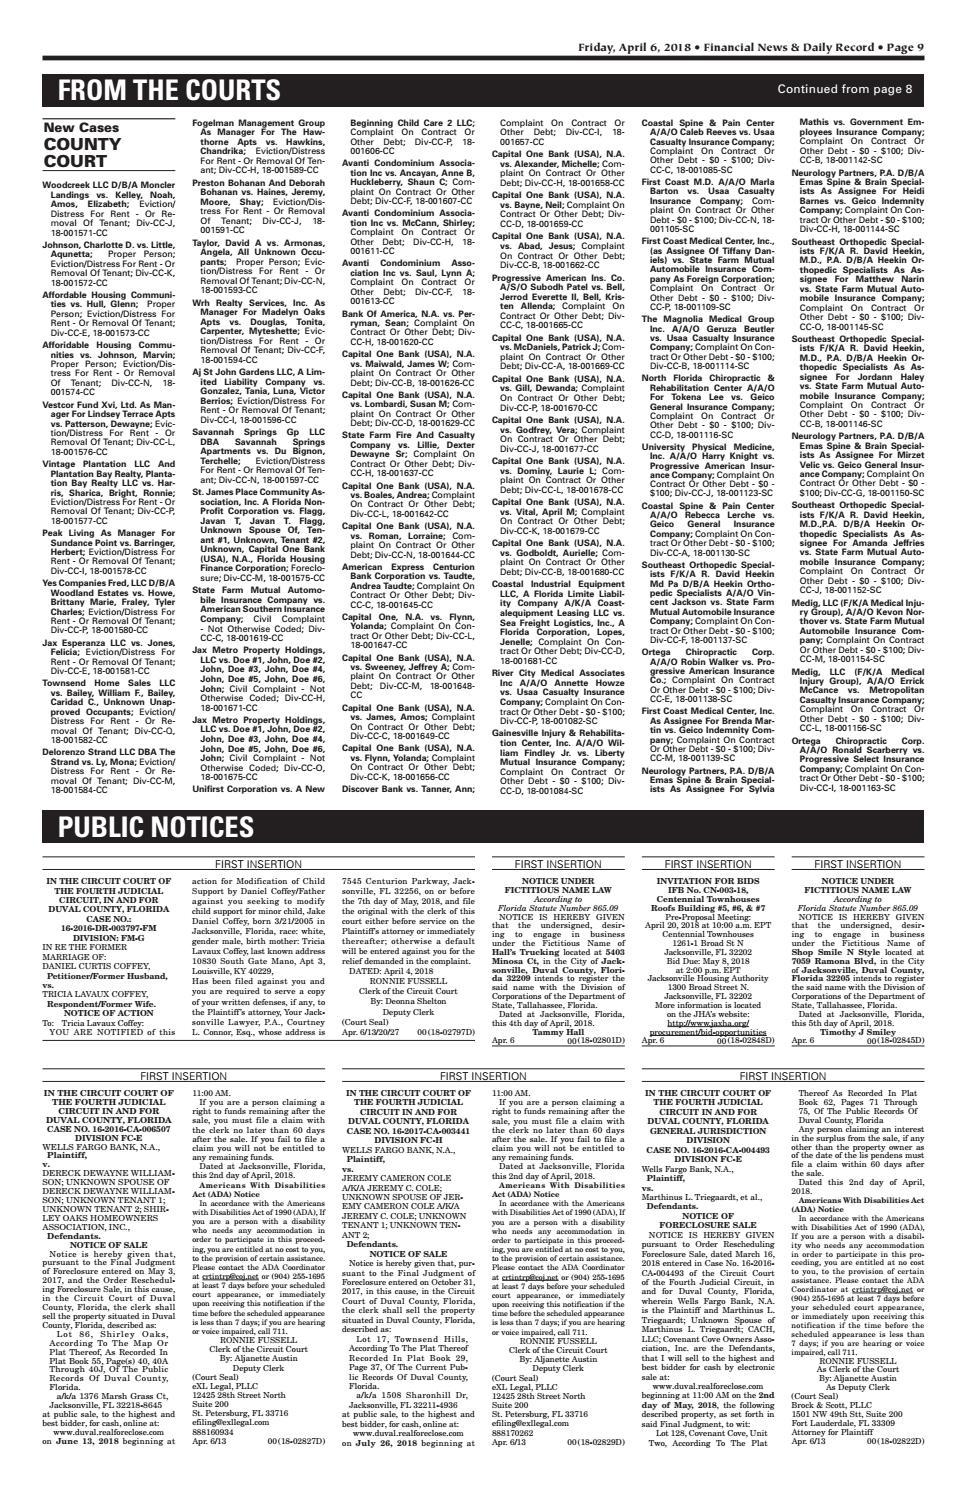 04 06 18 fndr by Daily Record & Observer LLC - issuu